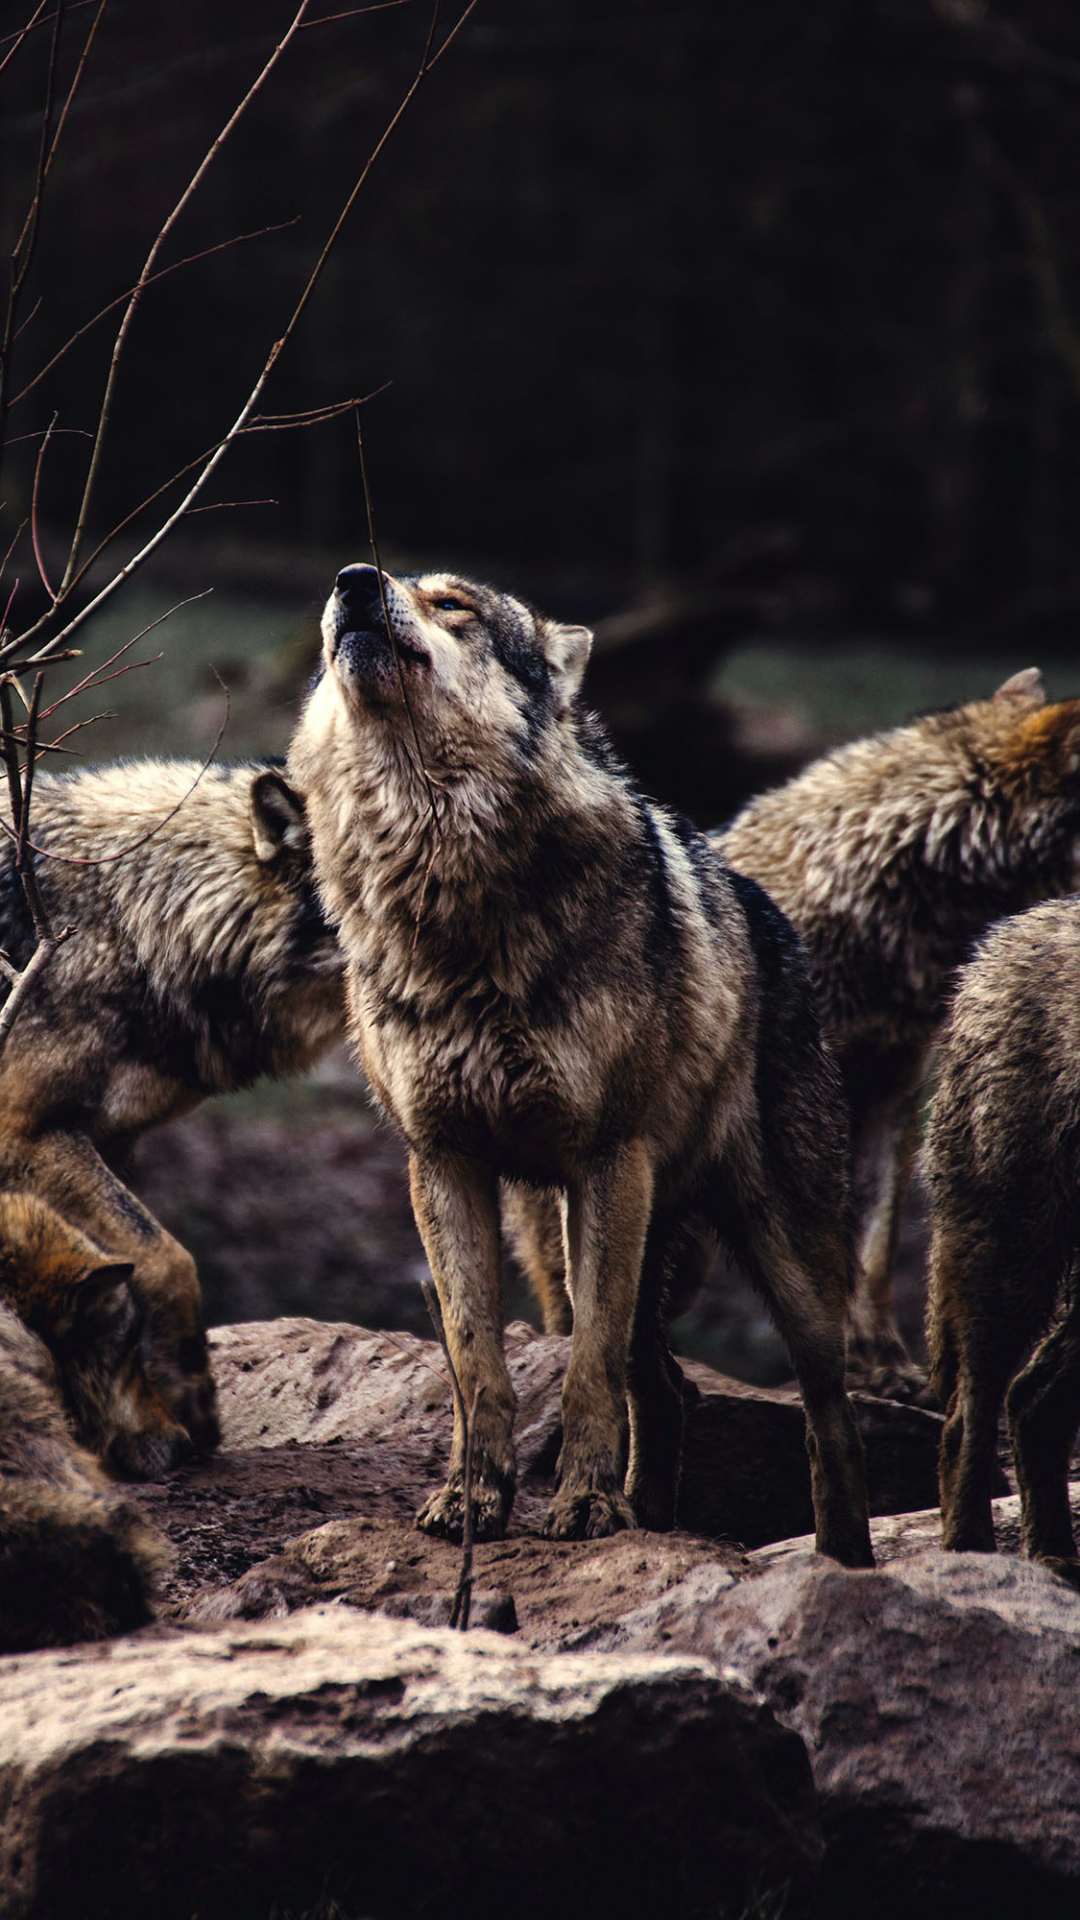 Animalwolf 1080x1920 Wallpaper Id 767709 Mobile Abyss